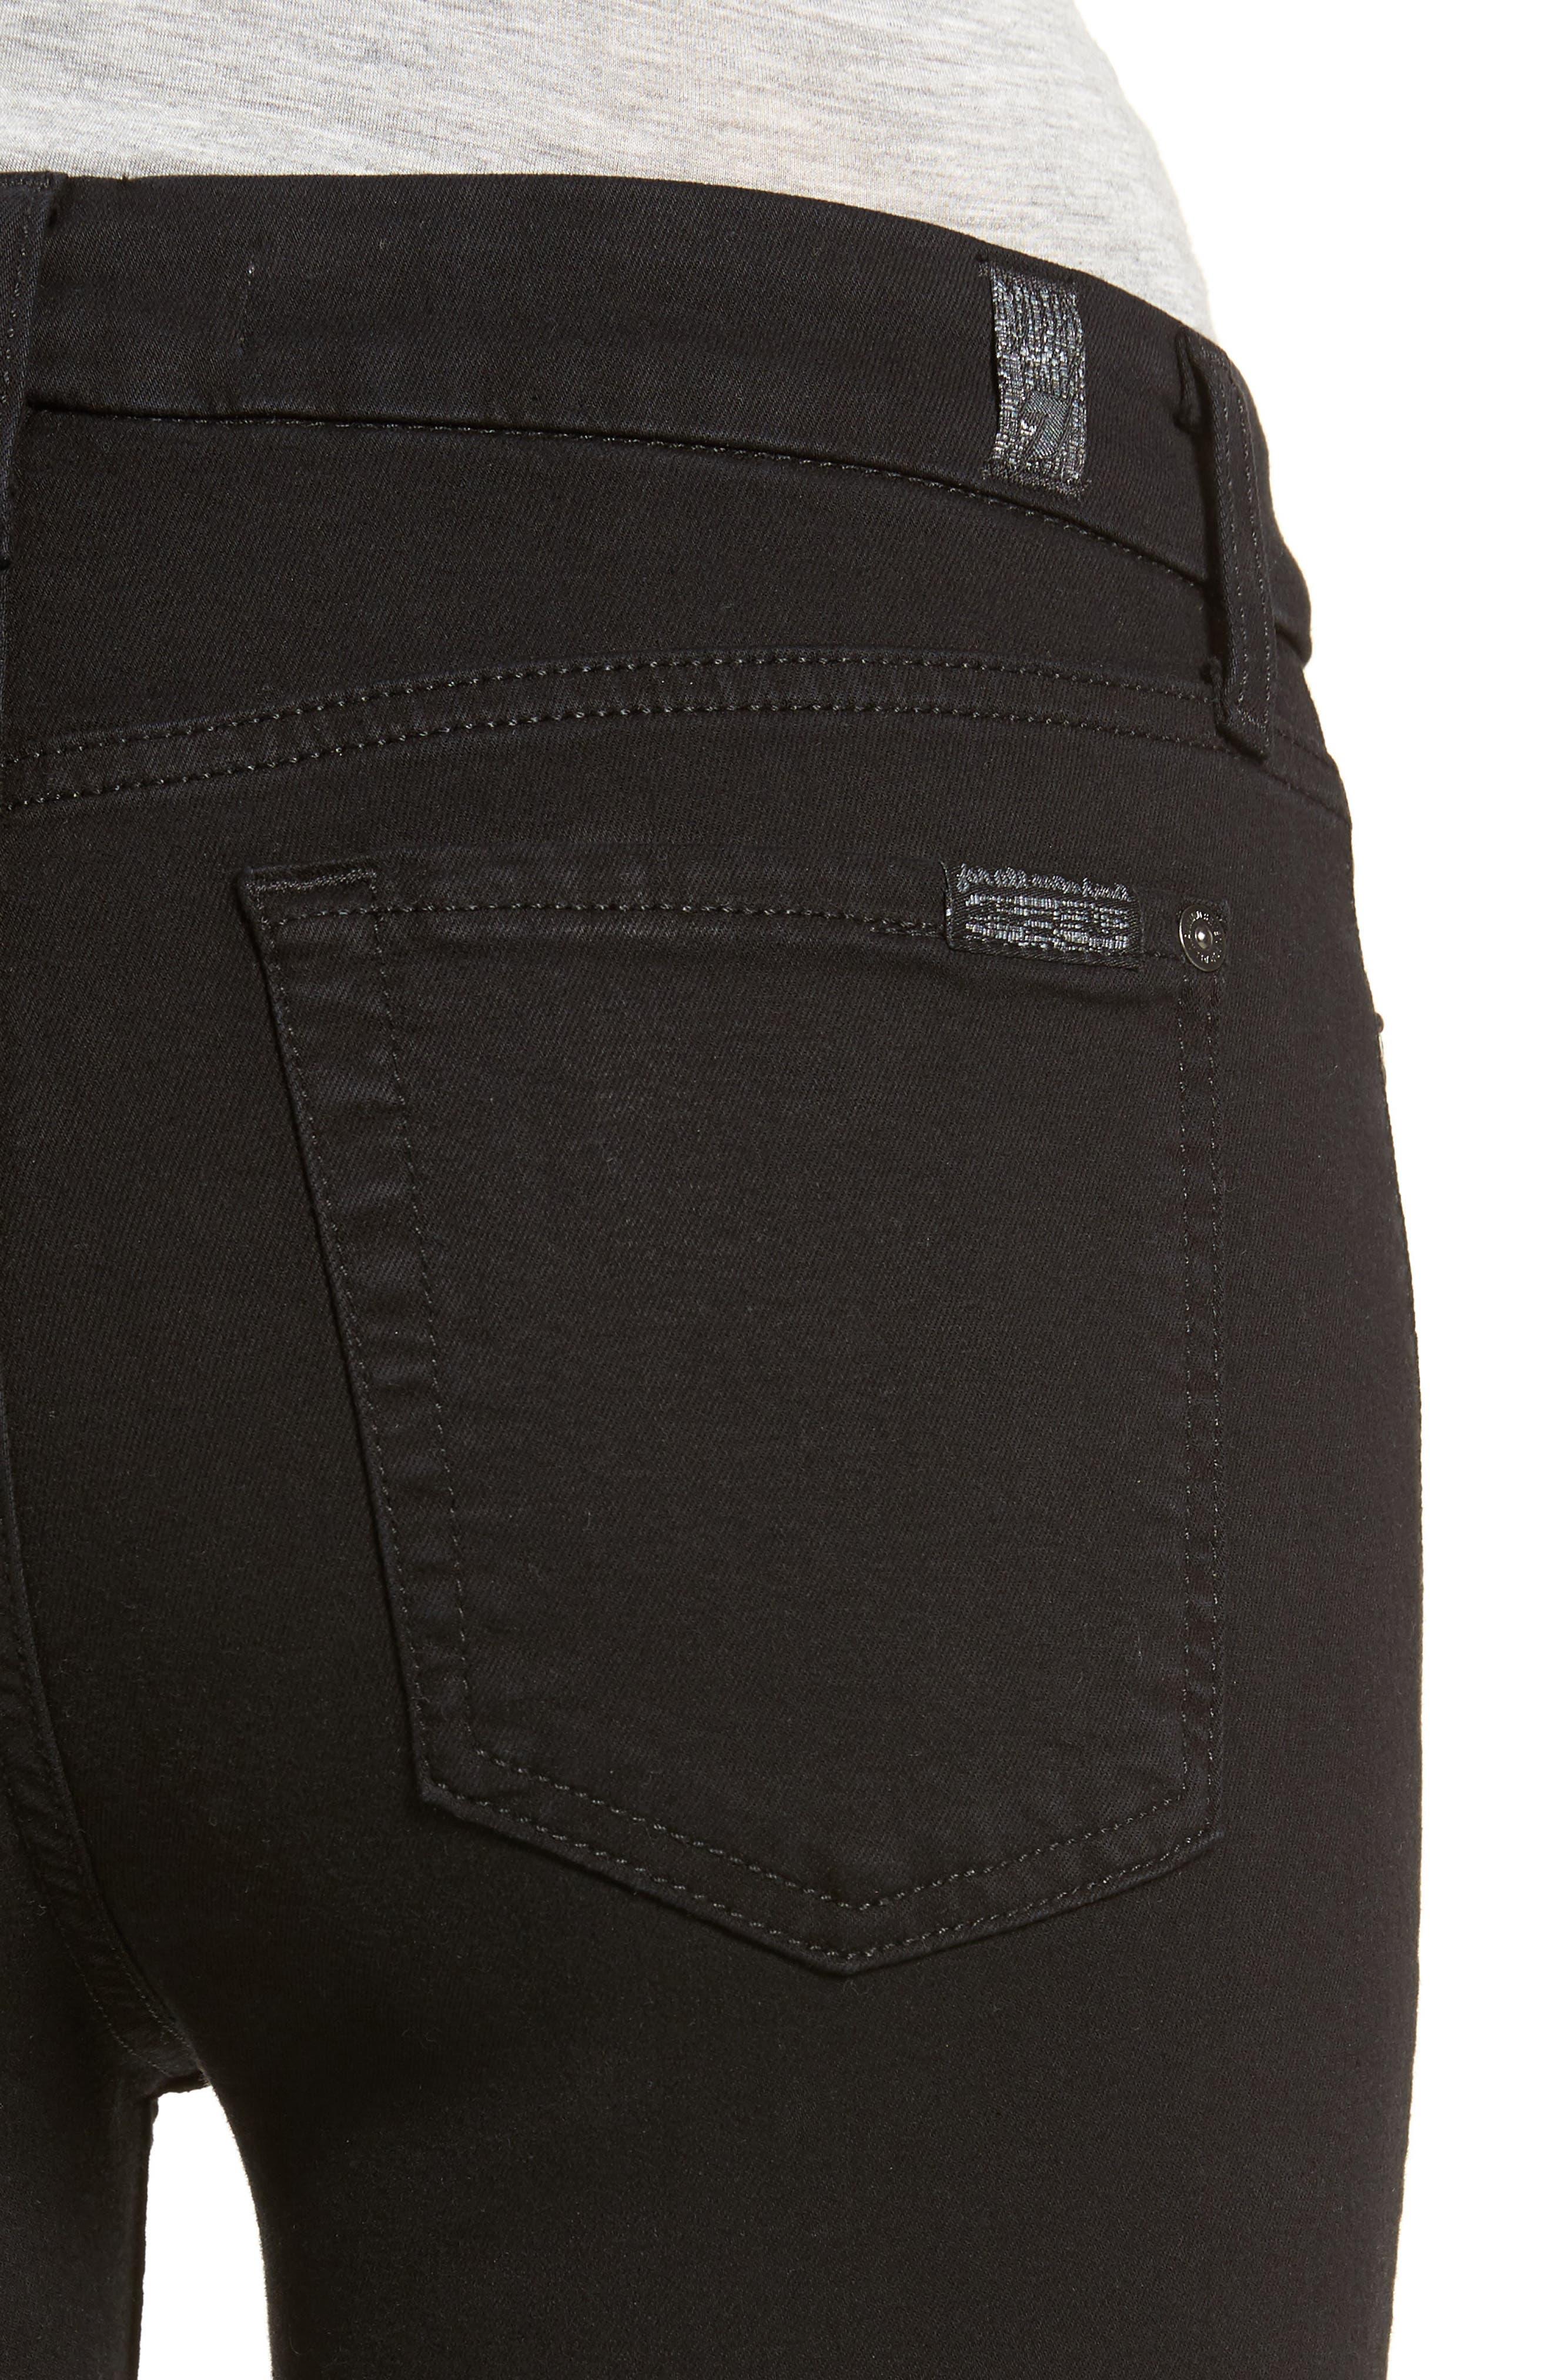 b(air) Ankle Skinny Jeans,                             Alternate thumbnail 4, color,                             BAIR BLACK 2